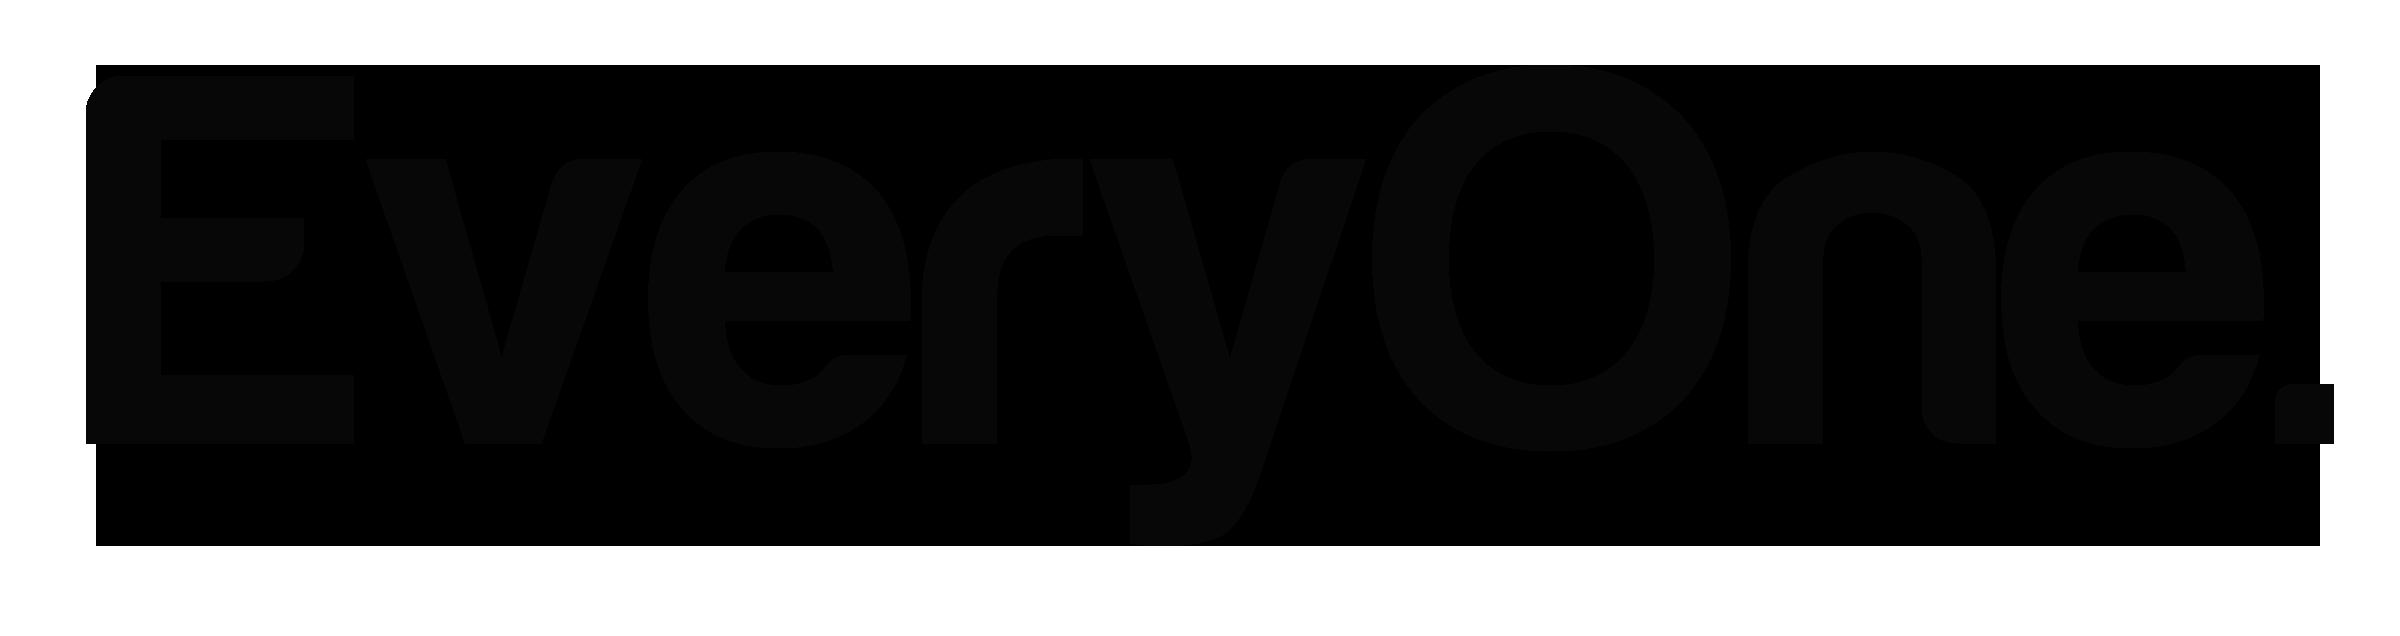 EveryOne. logo